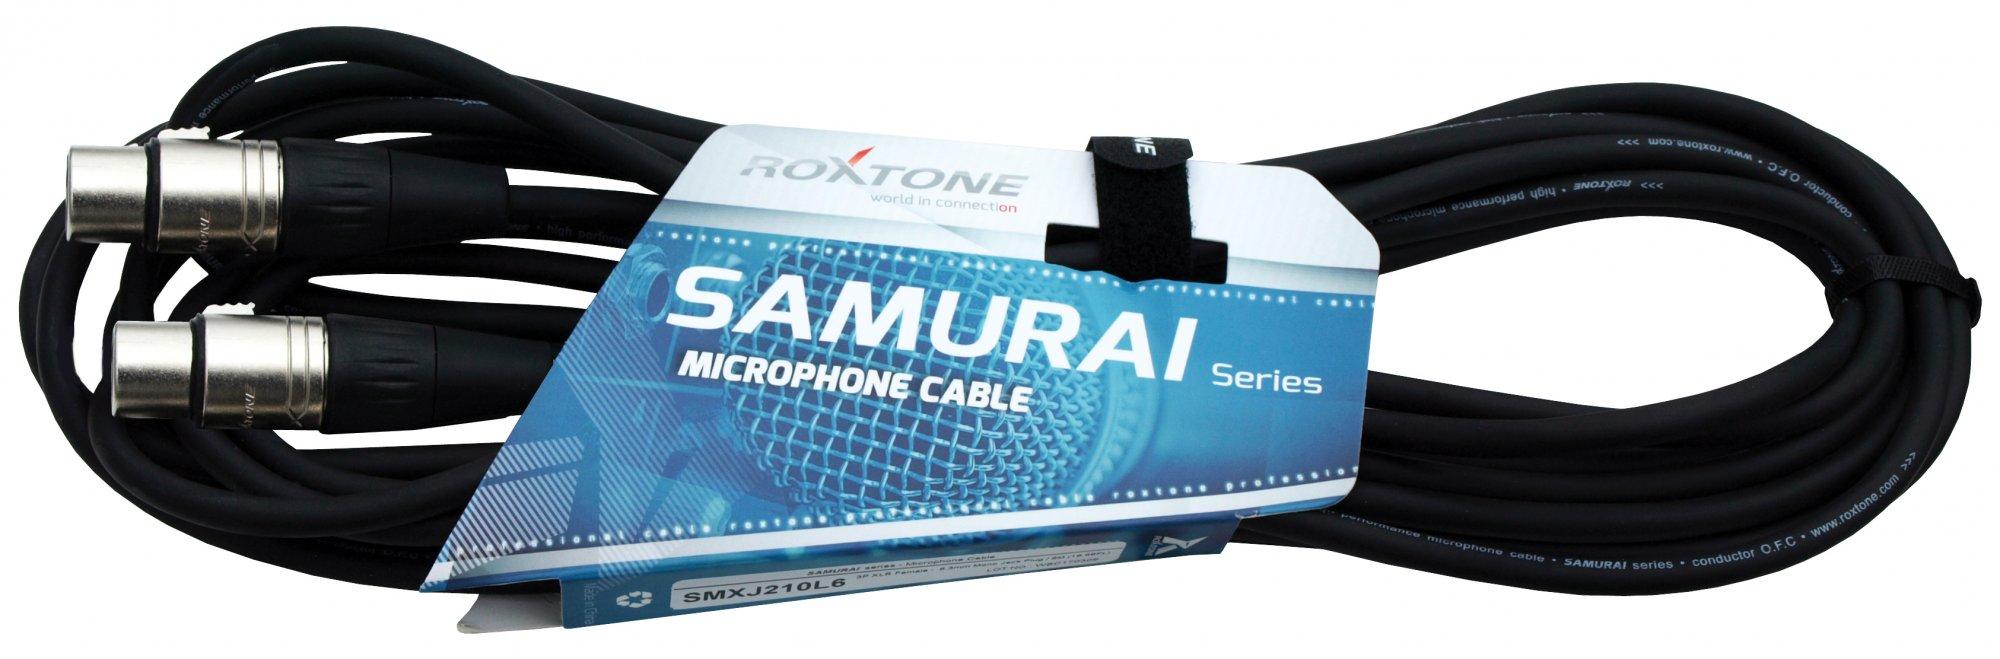 Roxtone Samurai SMXX200L6